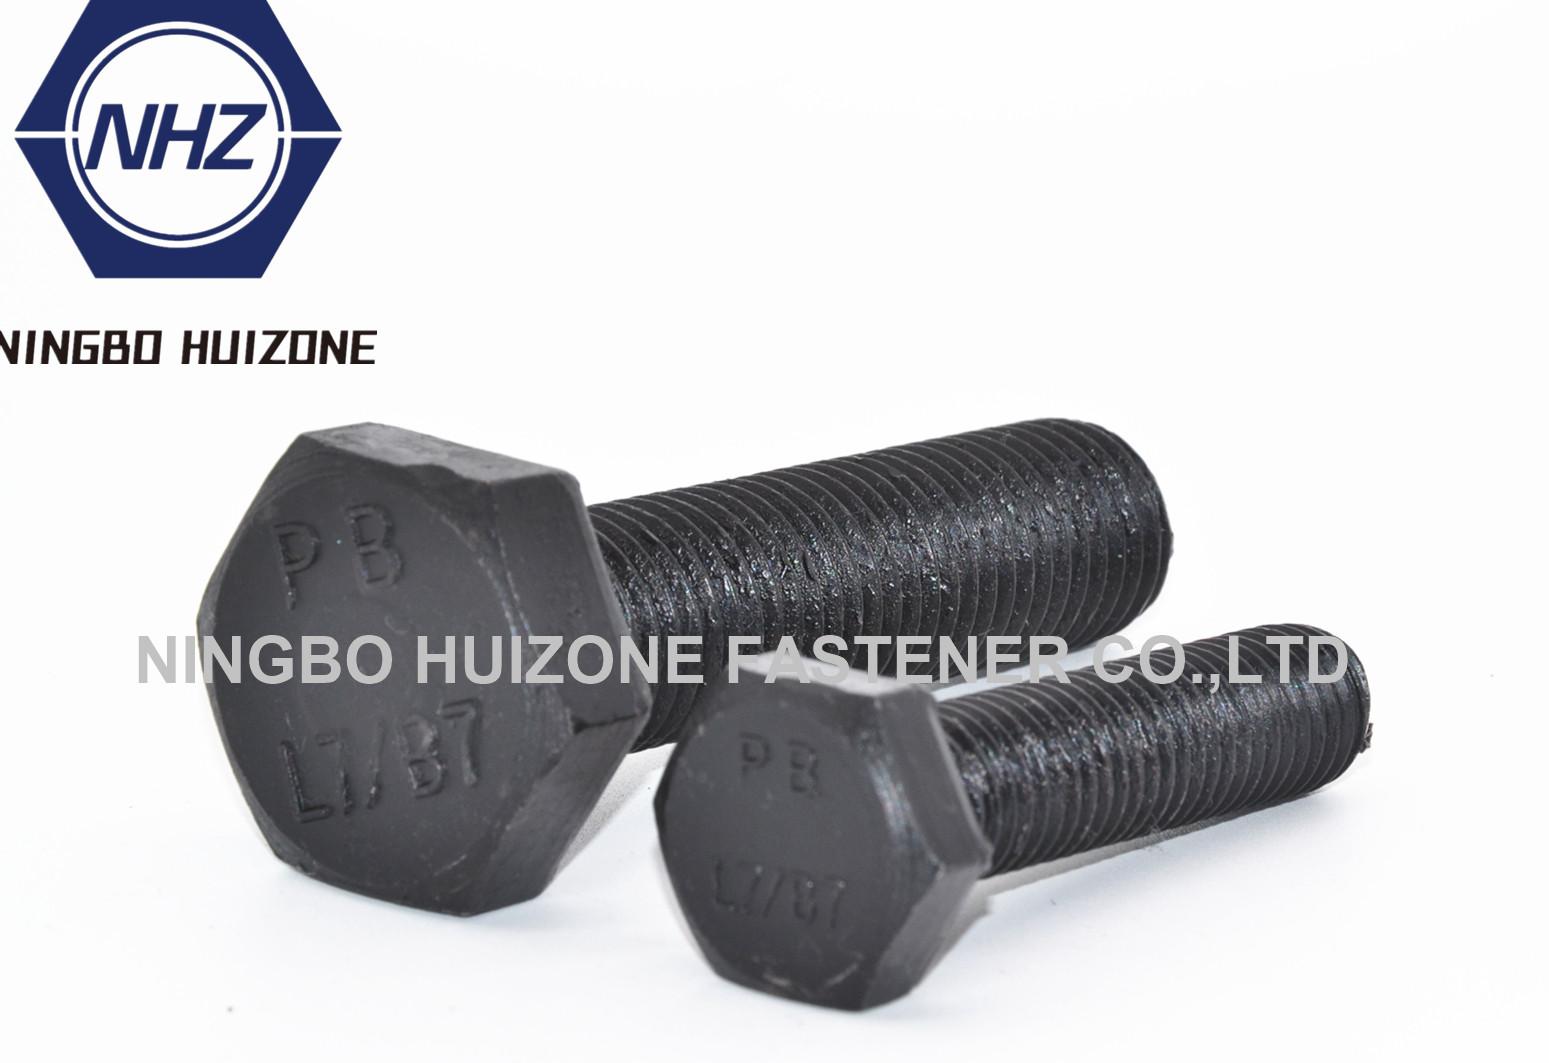 Heavy Hex Bolts ASTM A193A193M Grade B7B7MB8B8MB16ASTM A307 Grade B